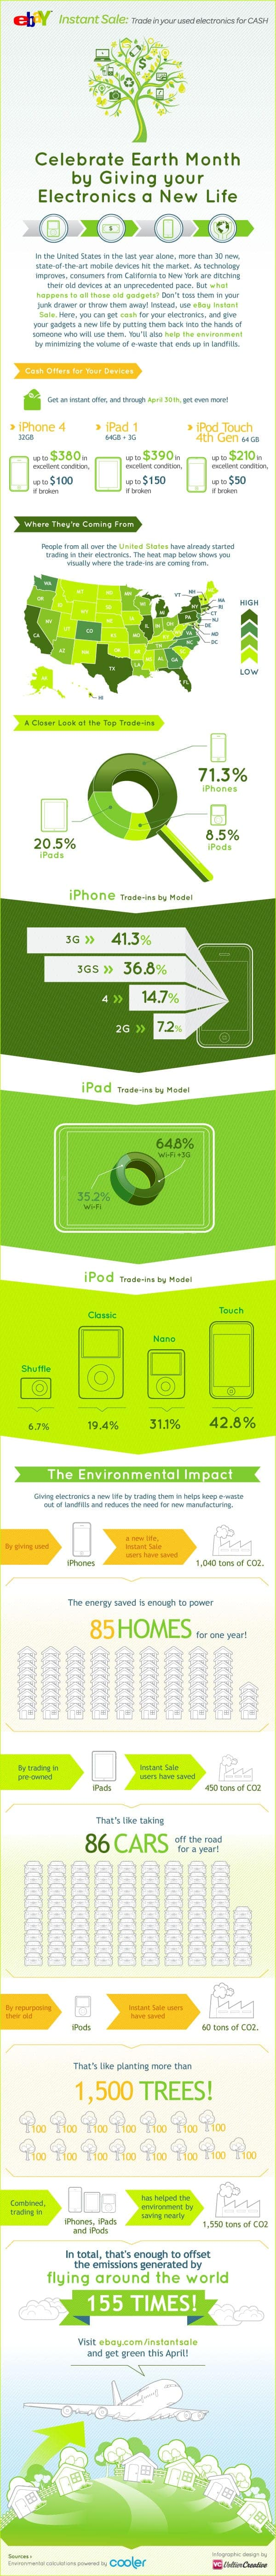 ebay_instant_sale_infographic